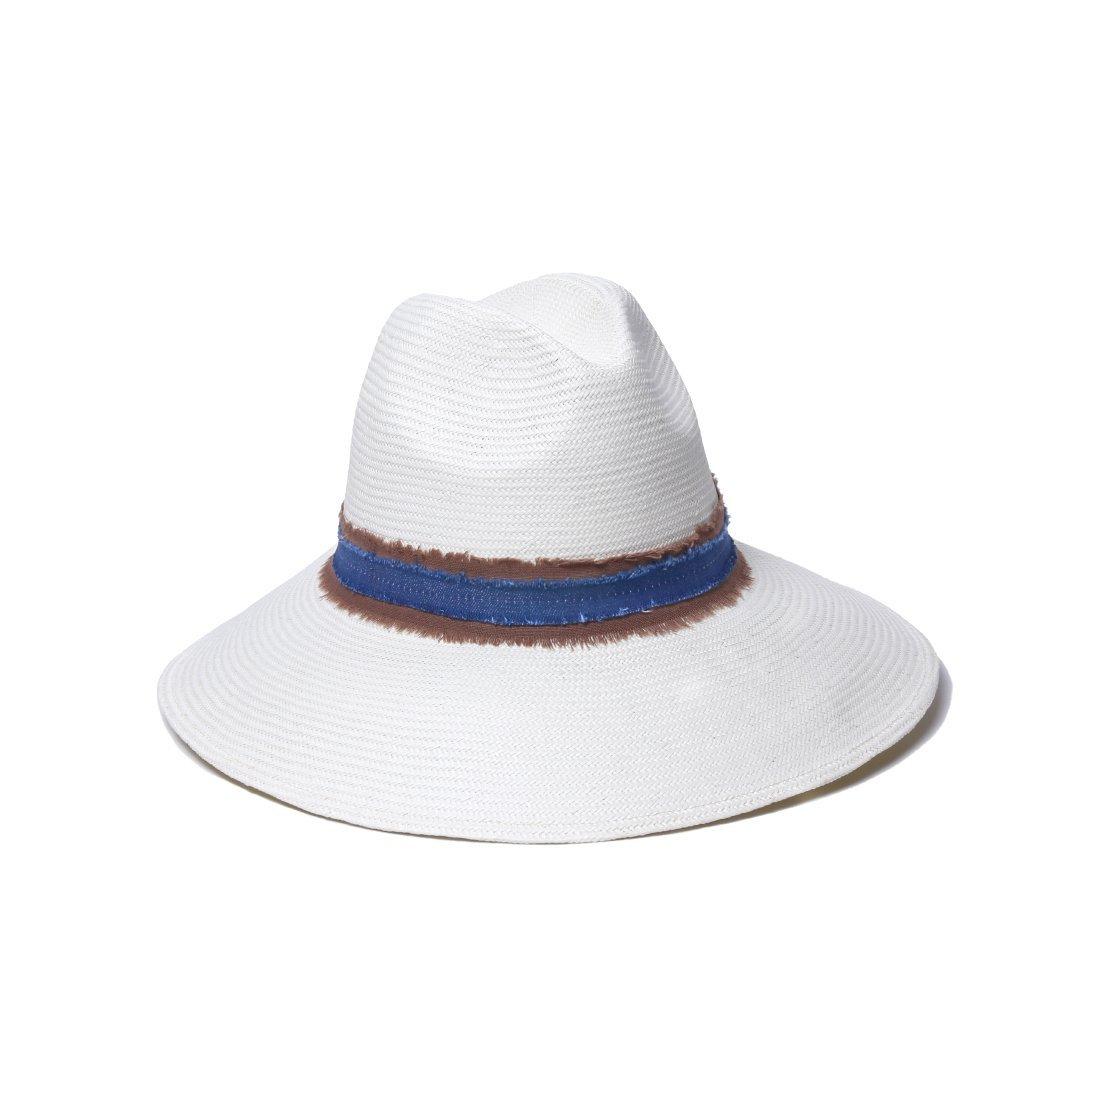 'ale by alessandra Women's Grosvenor Fine Panama Hat With Two-tone Canvas Trim, Ivory/Denim, One Size